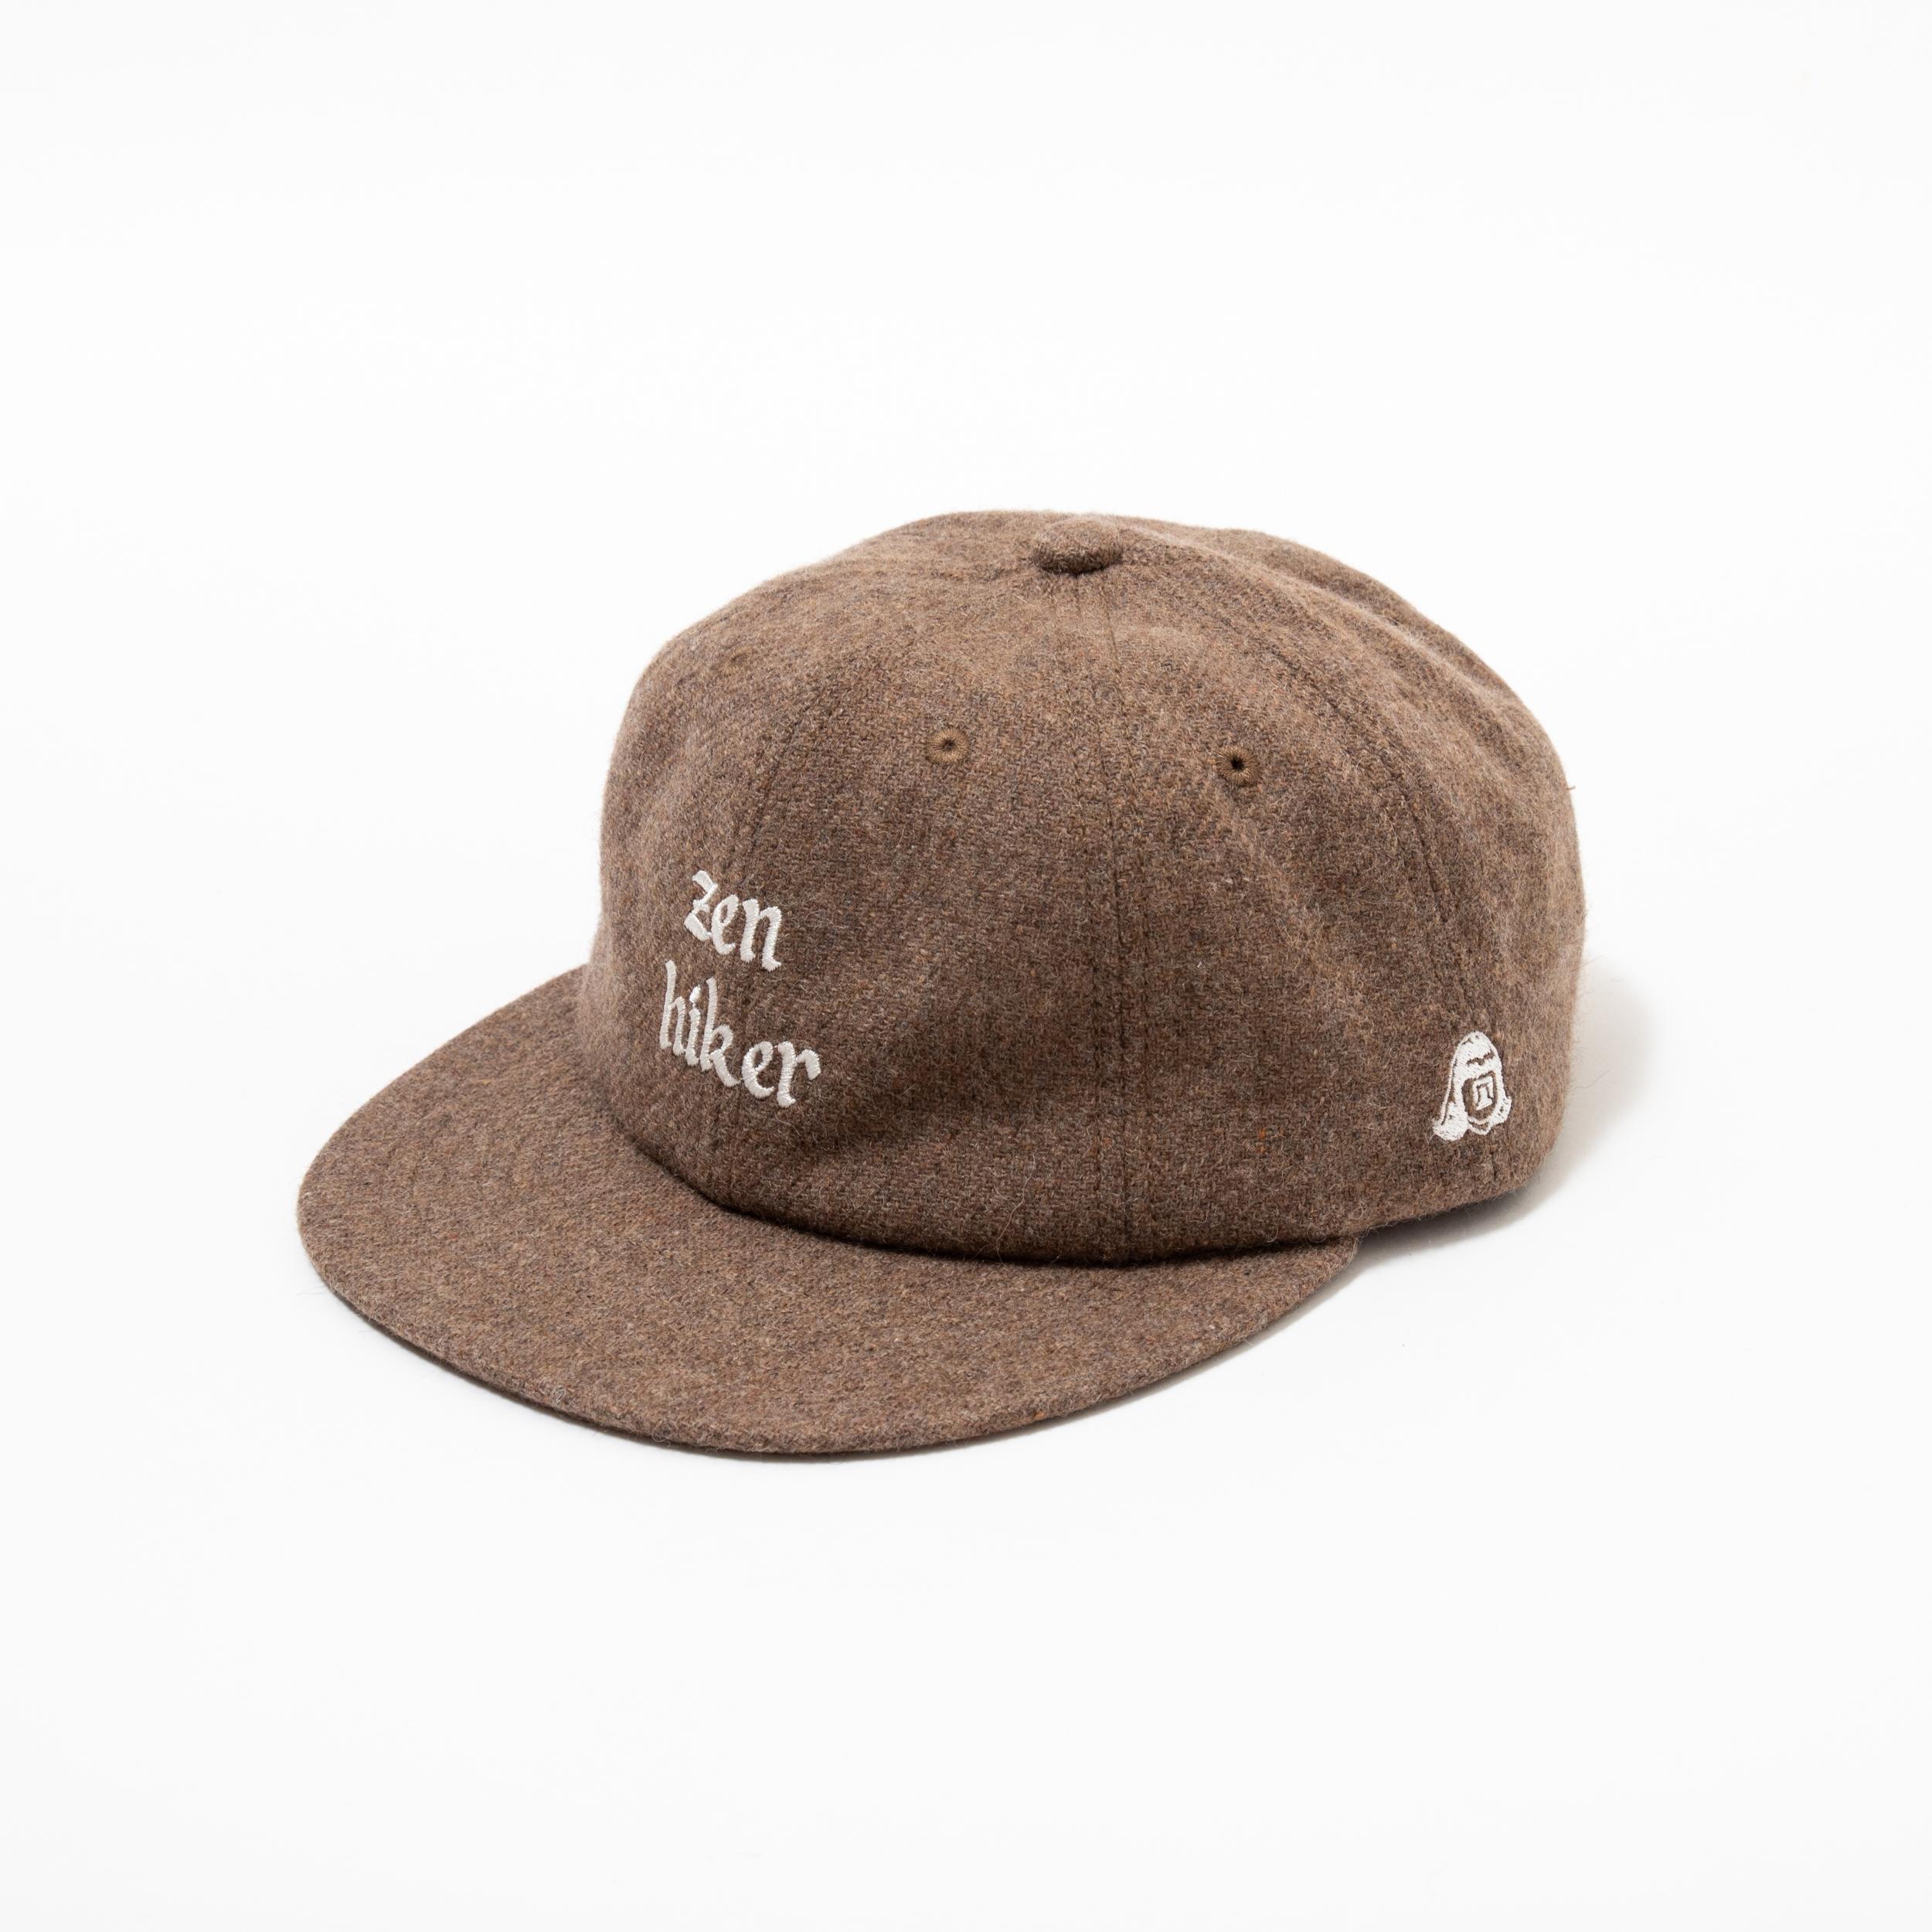 ZEN HIKER CAP designed by Jerry UKAI